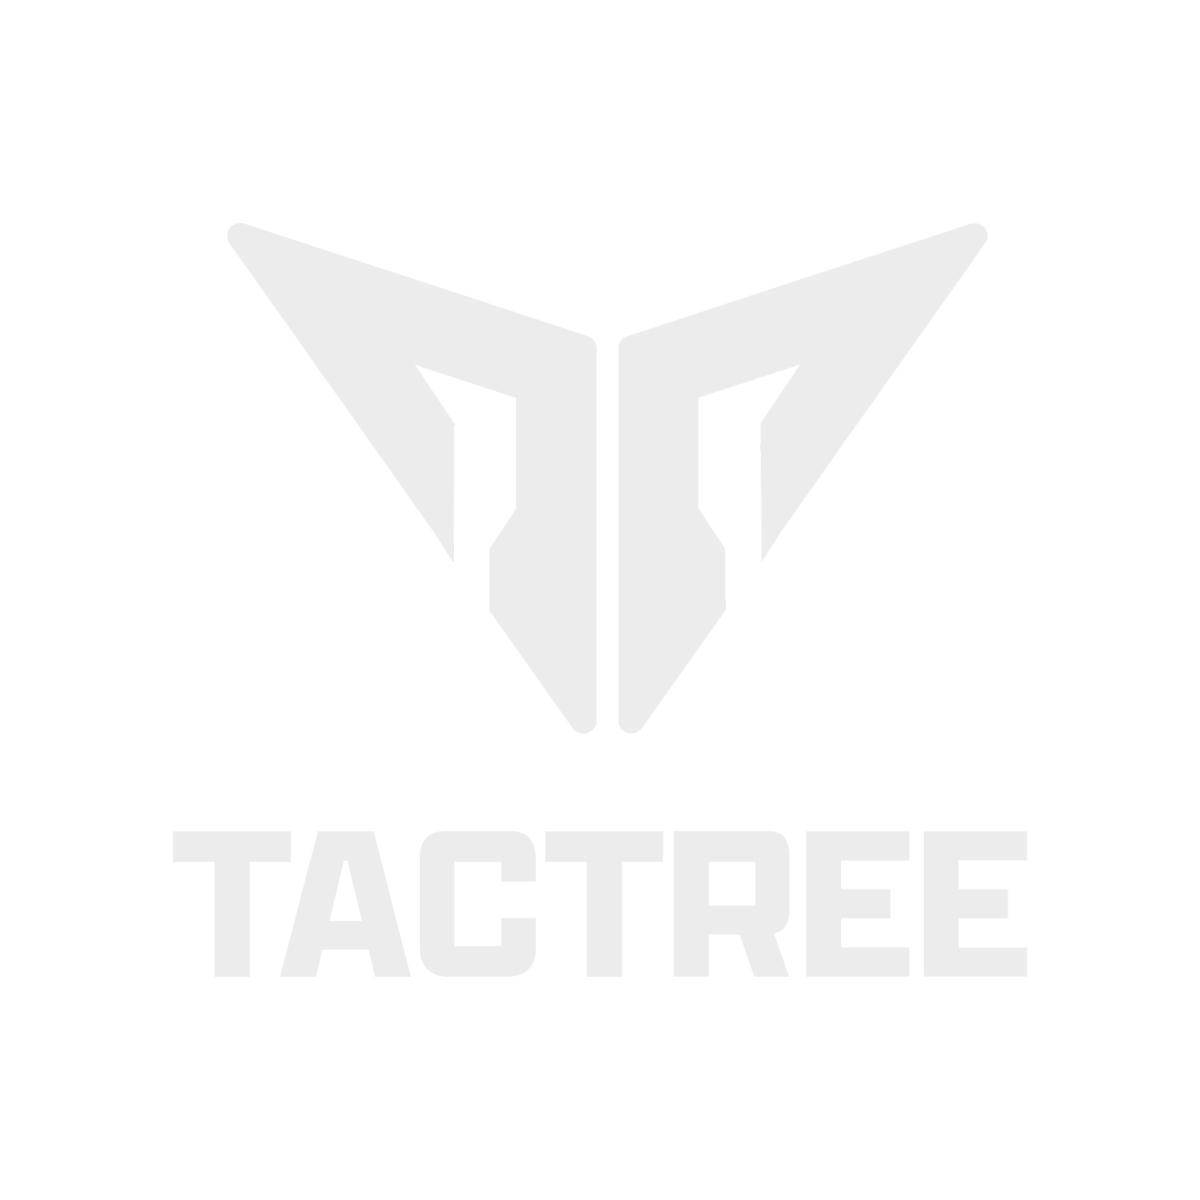 5.11 GEO7 Fast-Tac TDU Rapid Long Sleeve Shirt (Terrain)